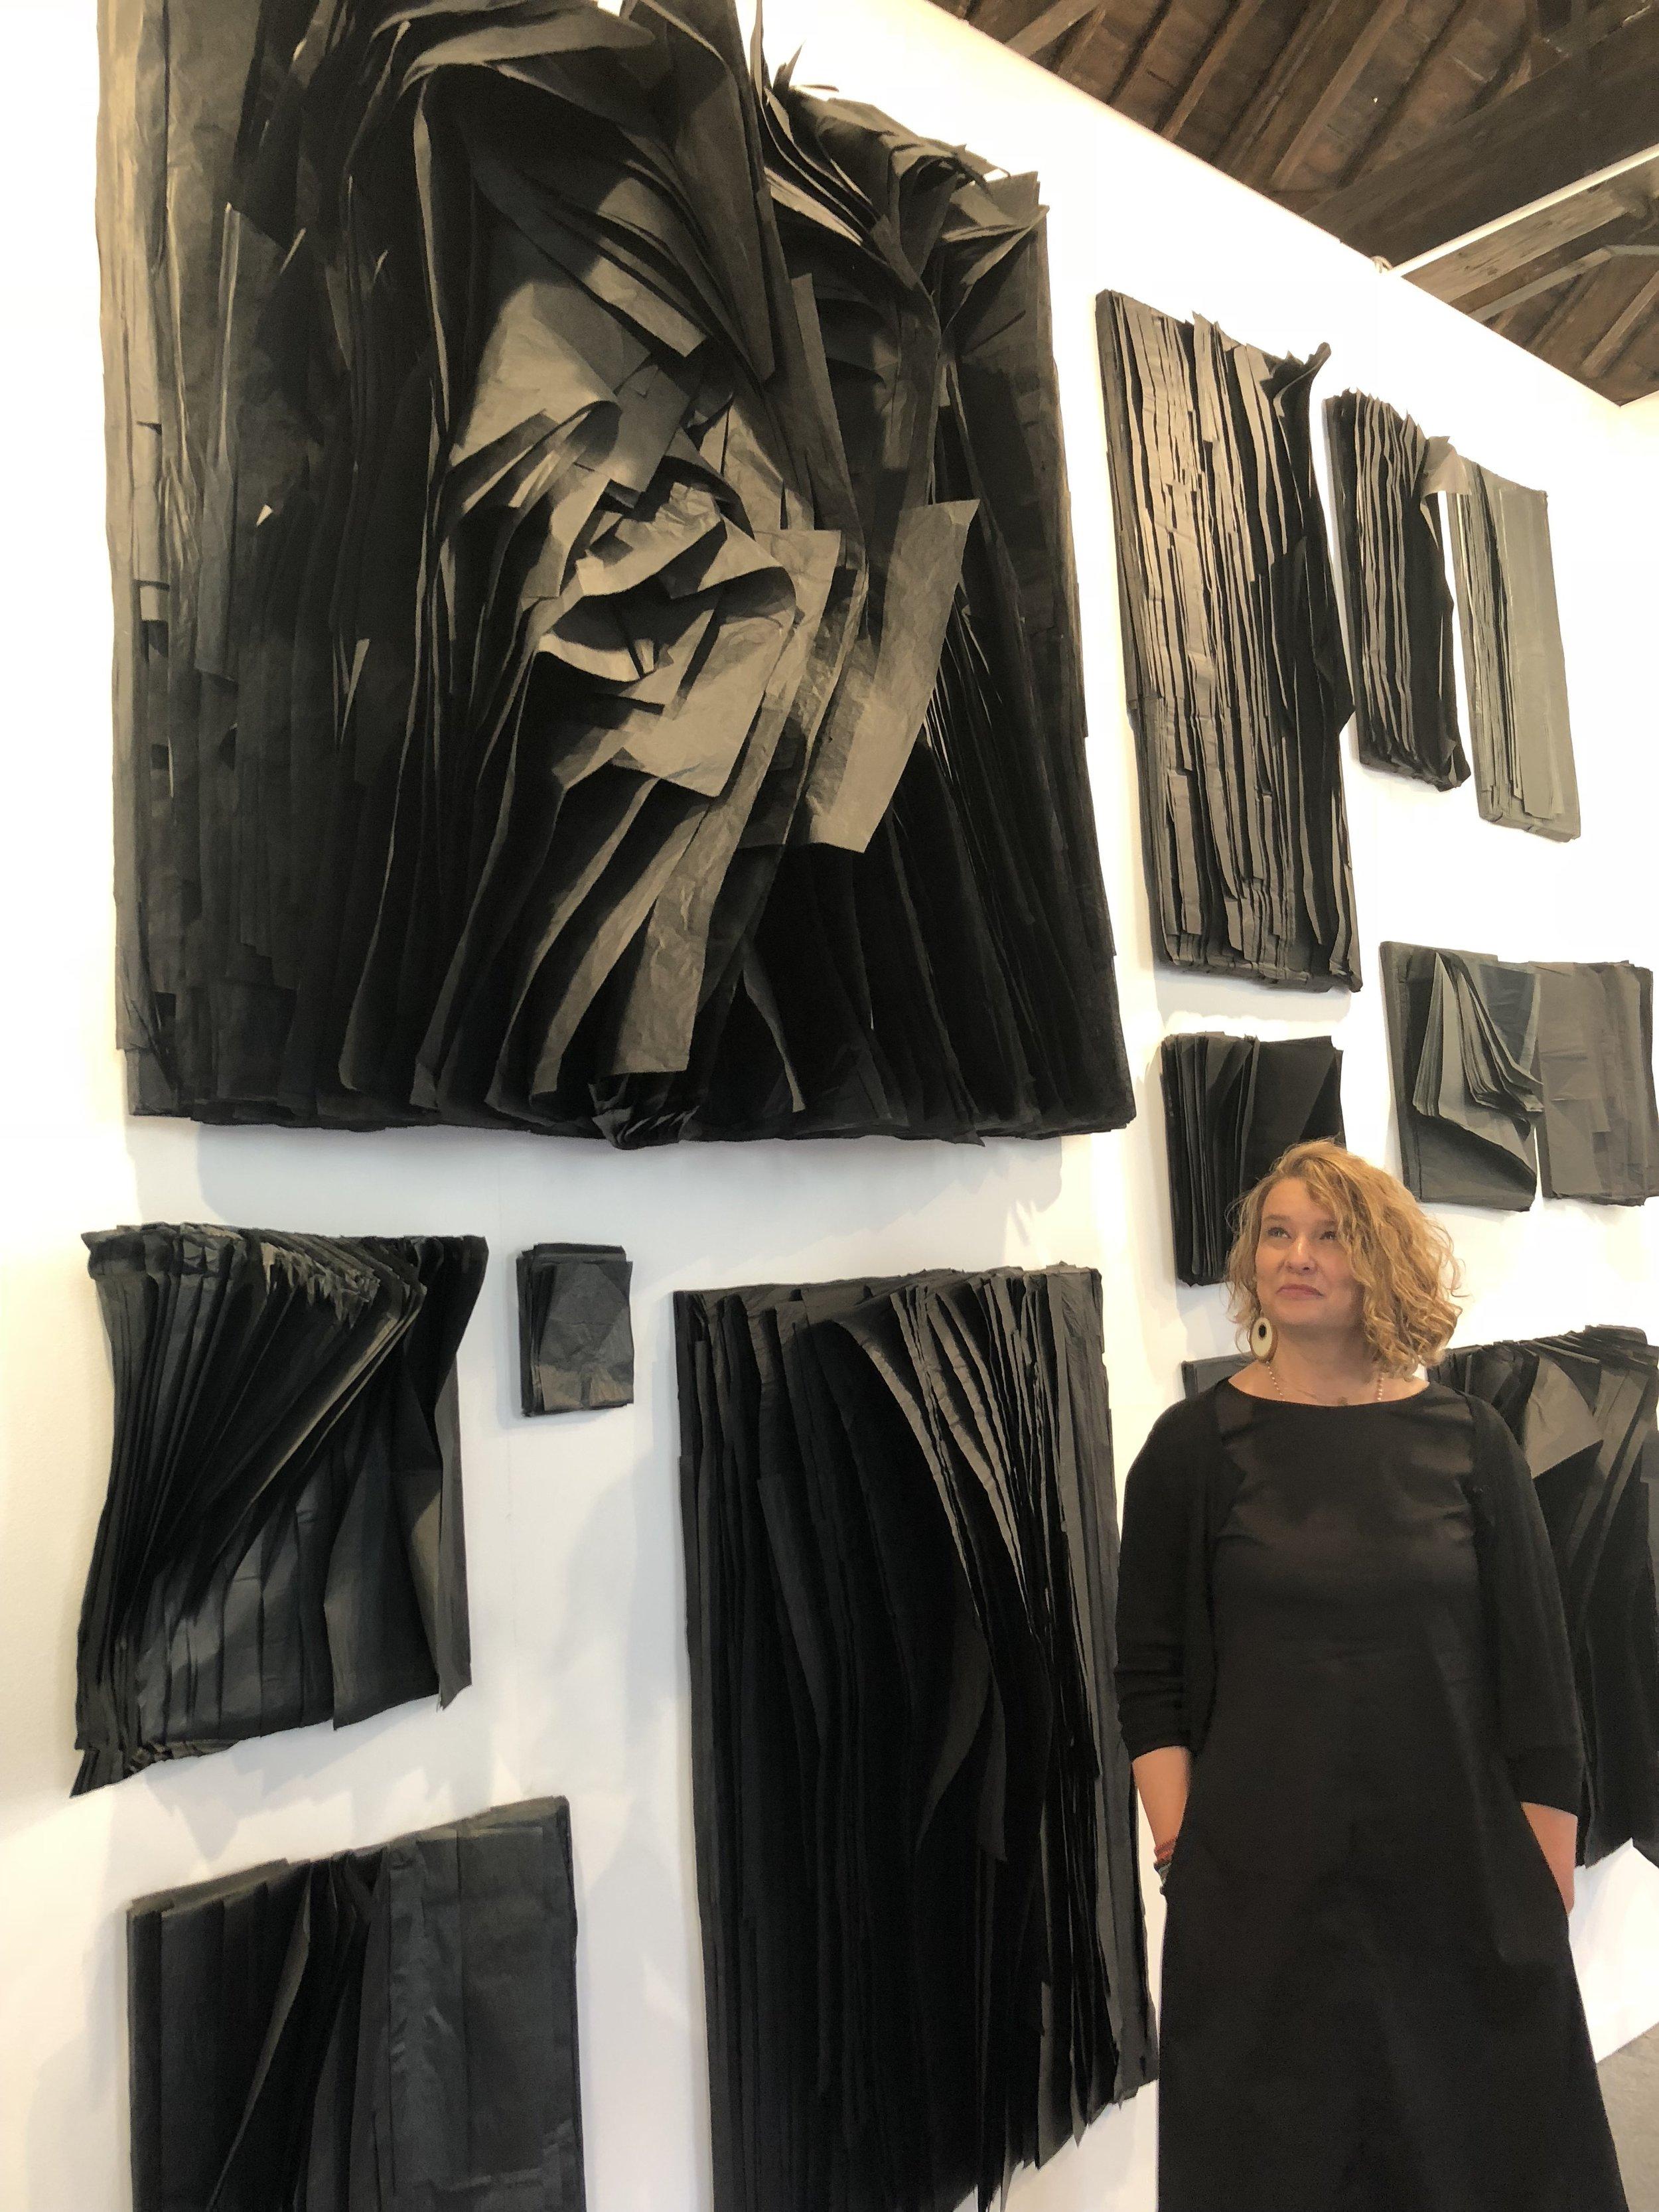 Sabrina Amrani gallery and the beautiful works of Joël Andrianomearisoa